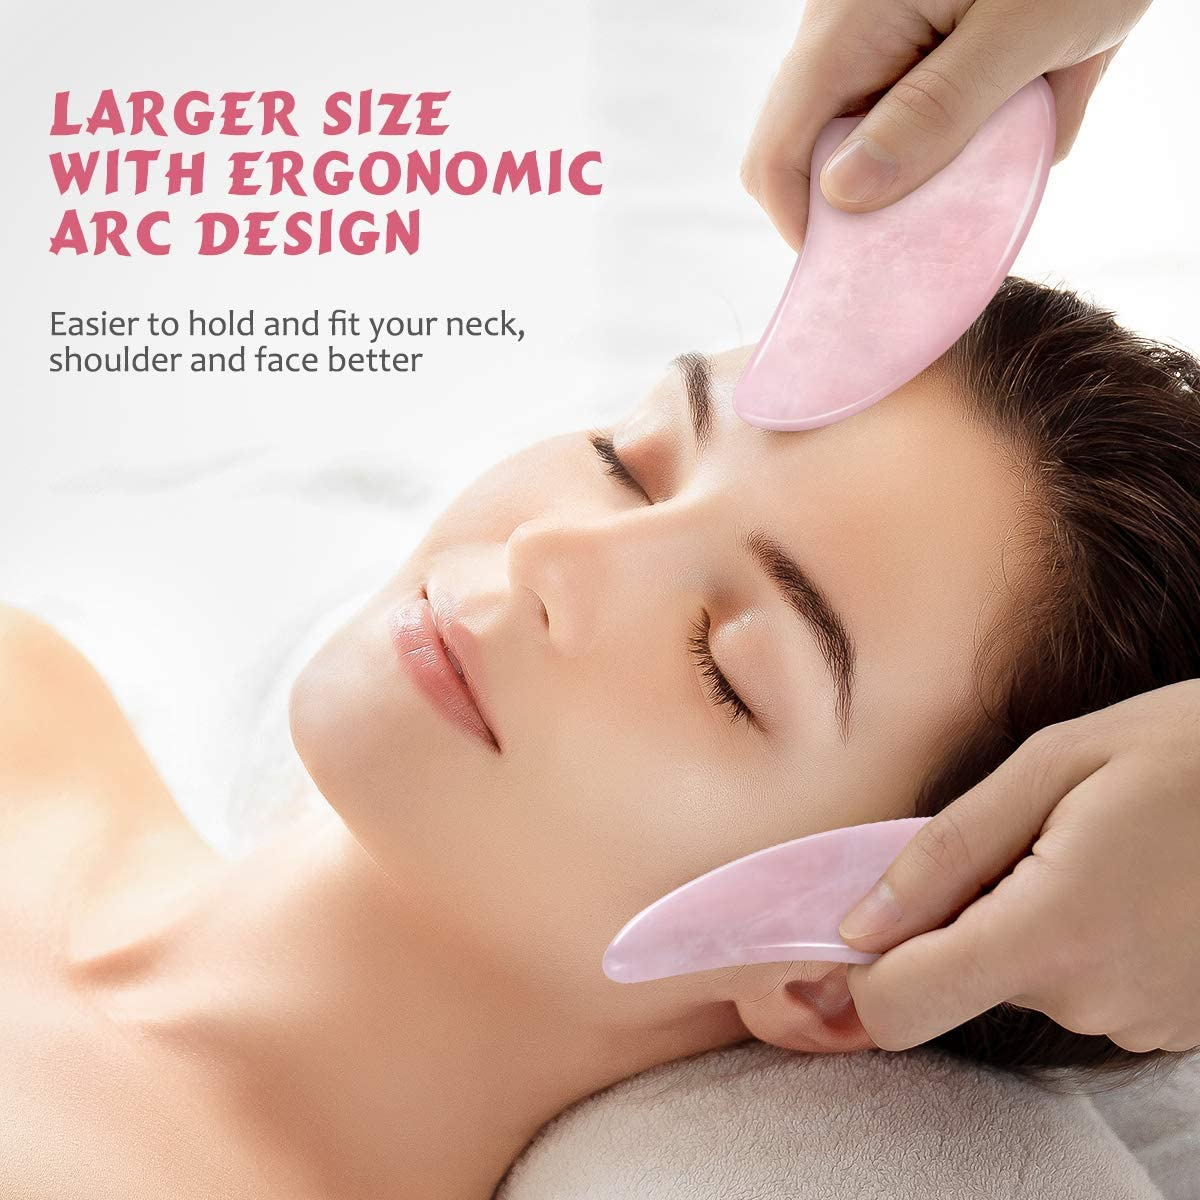 Gua Sha Tool, Natural Gua Sha Jade Stone Guasha Board Scraping Massage Tools for SPA Acupuncture Therapy Treatment